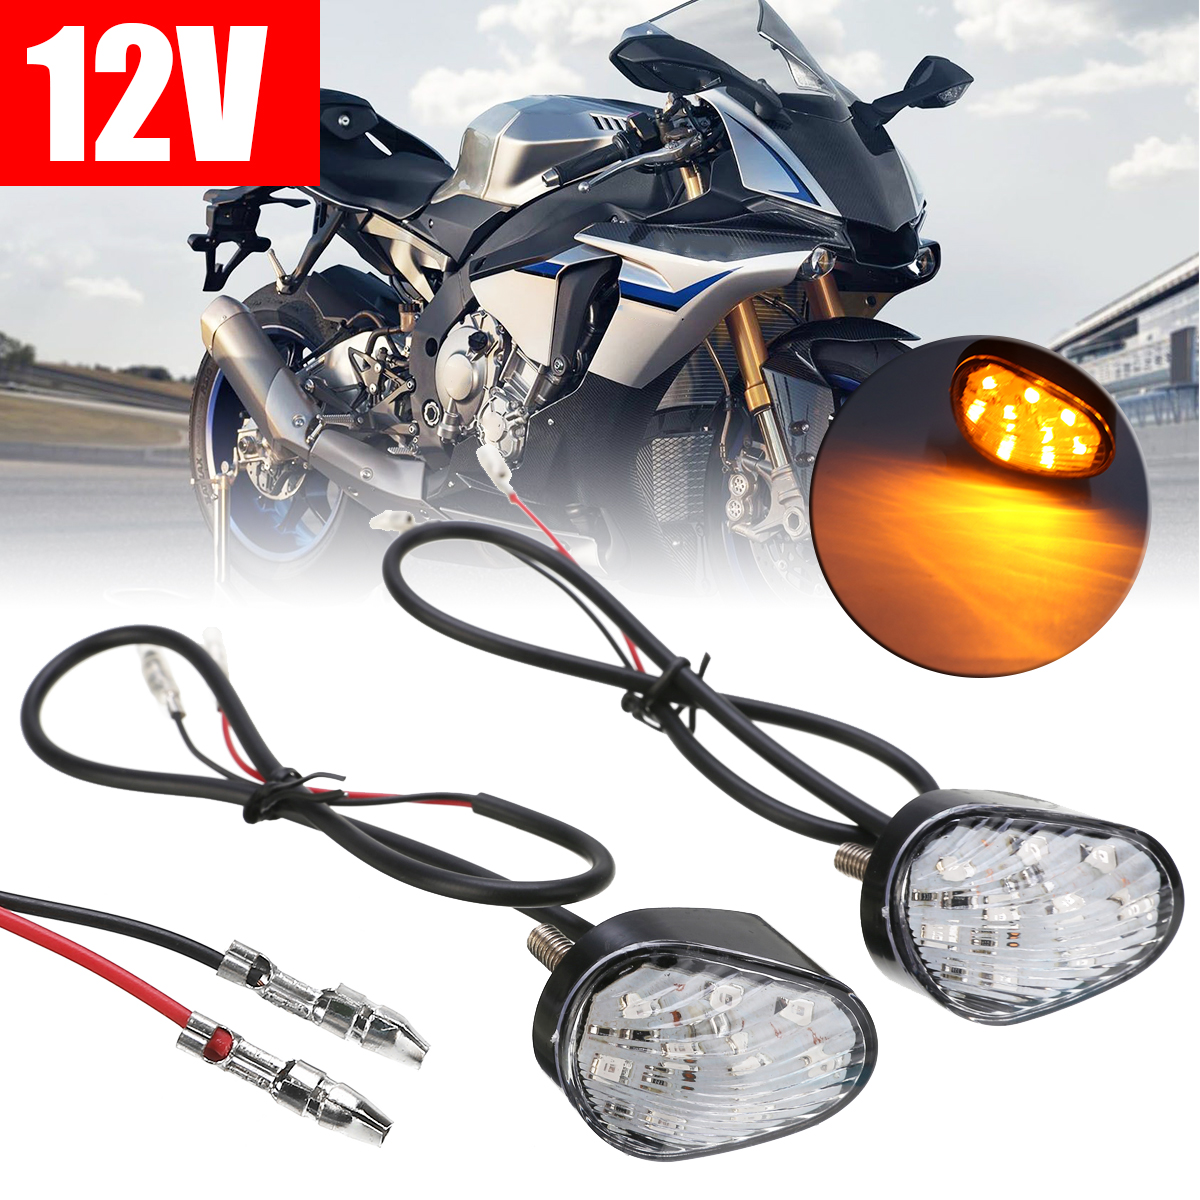 /2005 /2008/de YZF R6/2003/ Motocicleta Blinker Intermitentes Blink l/ámpara indicador para Yamaha YZF R1/2002/